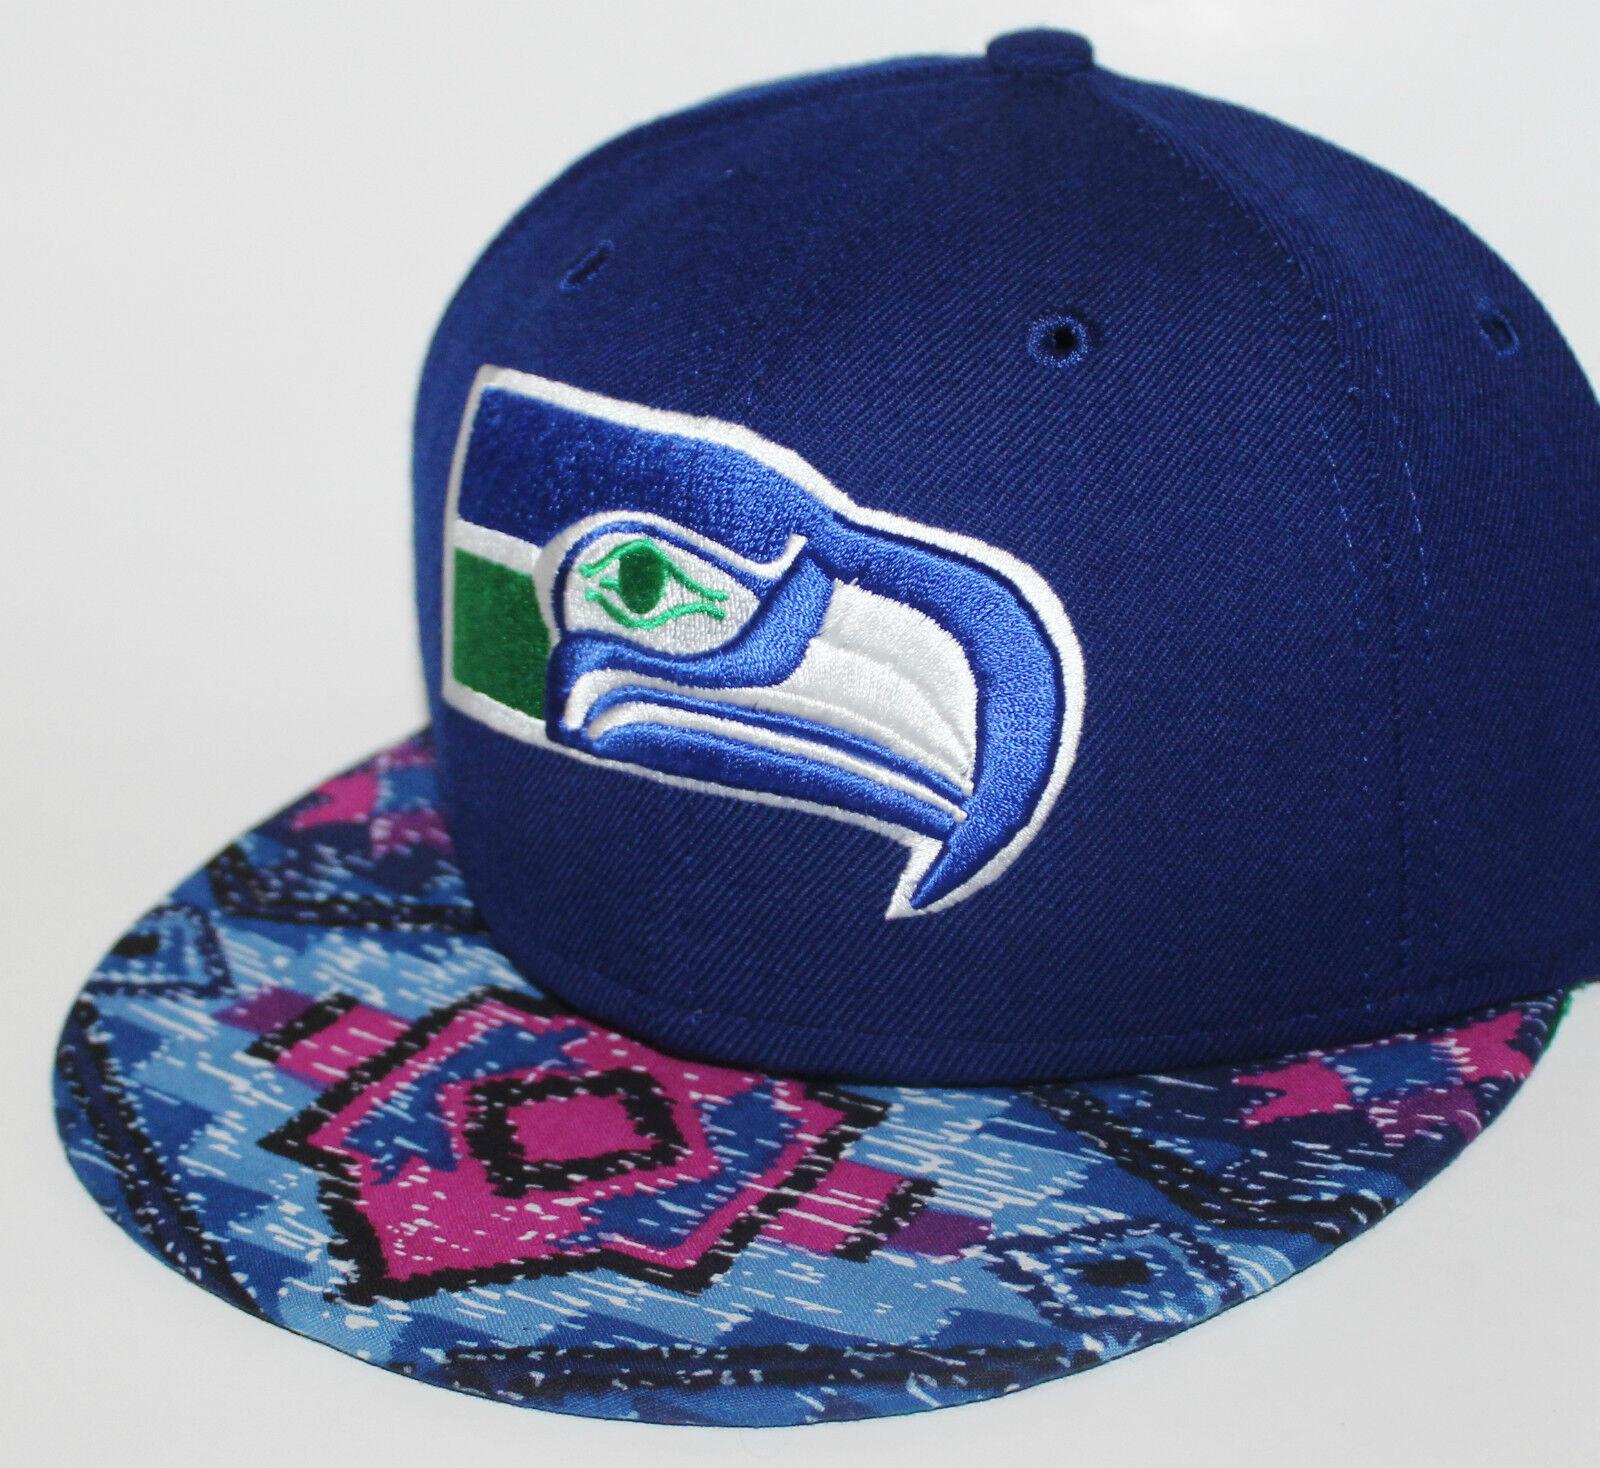 PICK1 Seattle Seahawks Native / Galaxy / Weed Bri… - image 8